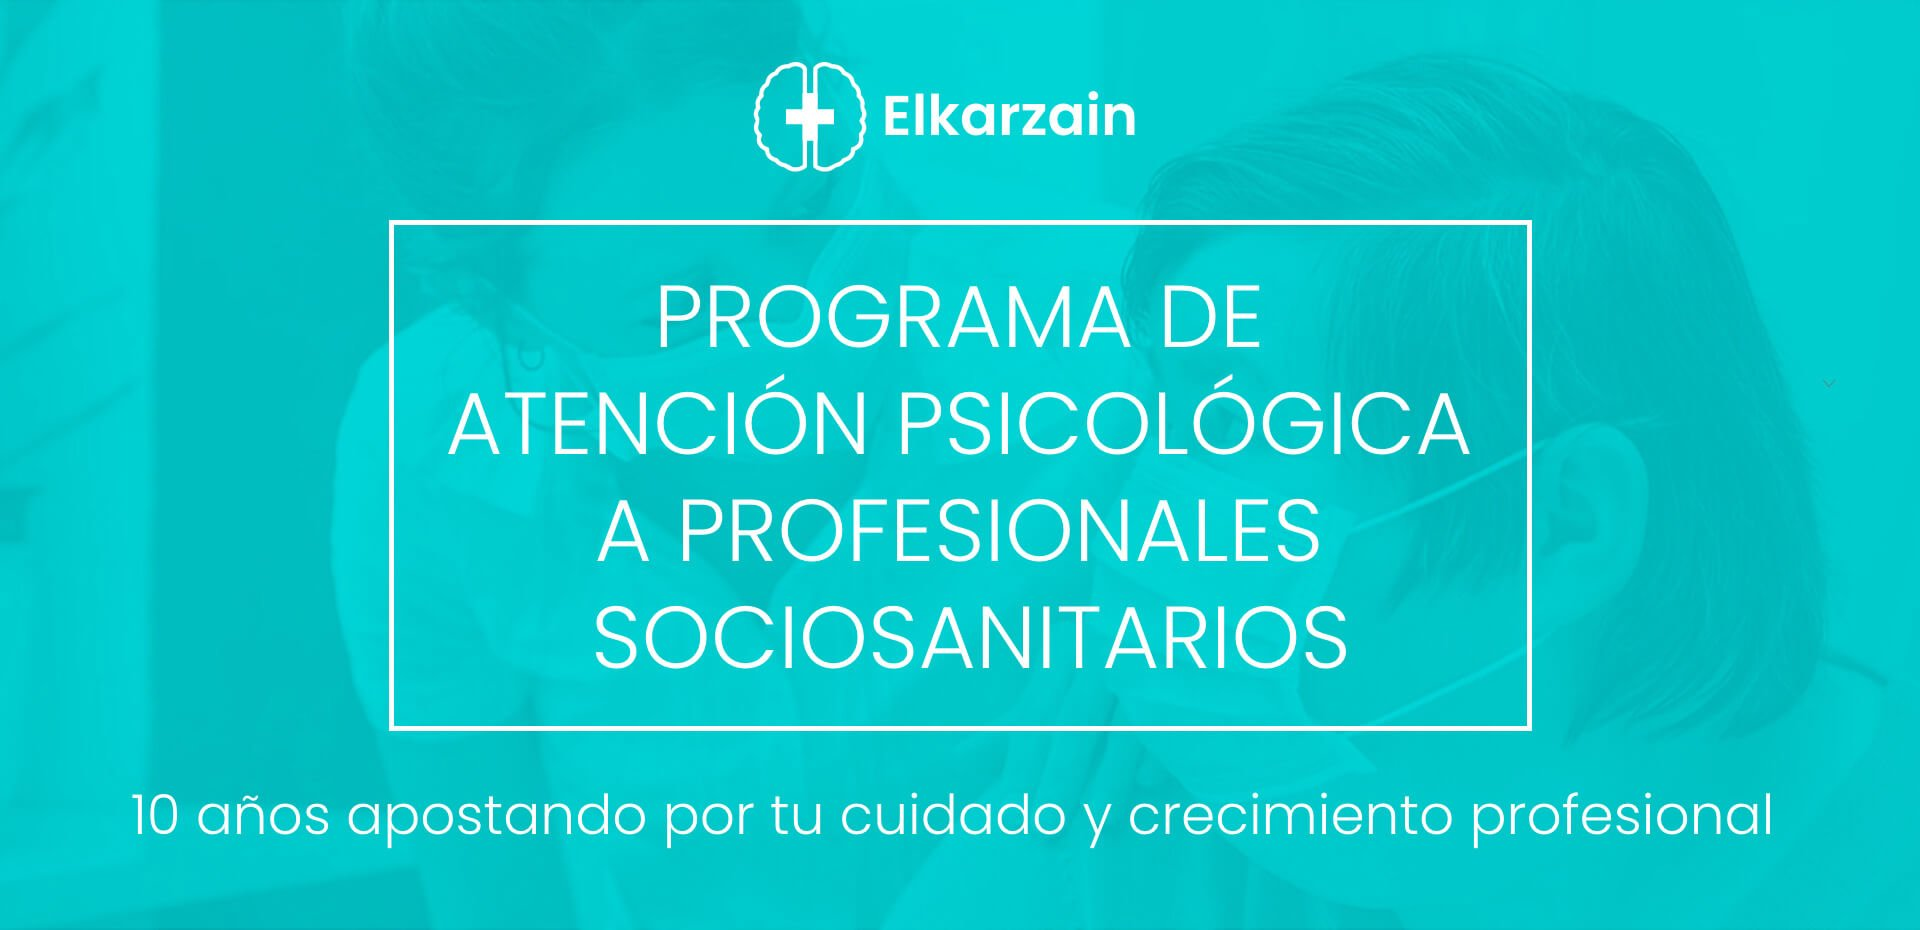 Proyectos Bobysuh: Campaña Programa ELKARZAIN